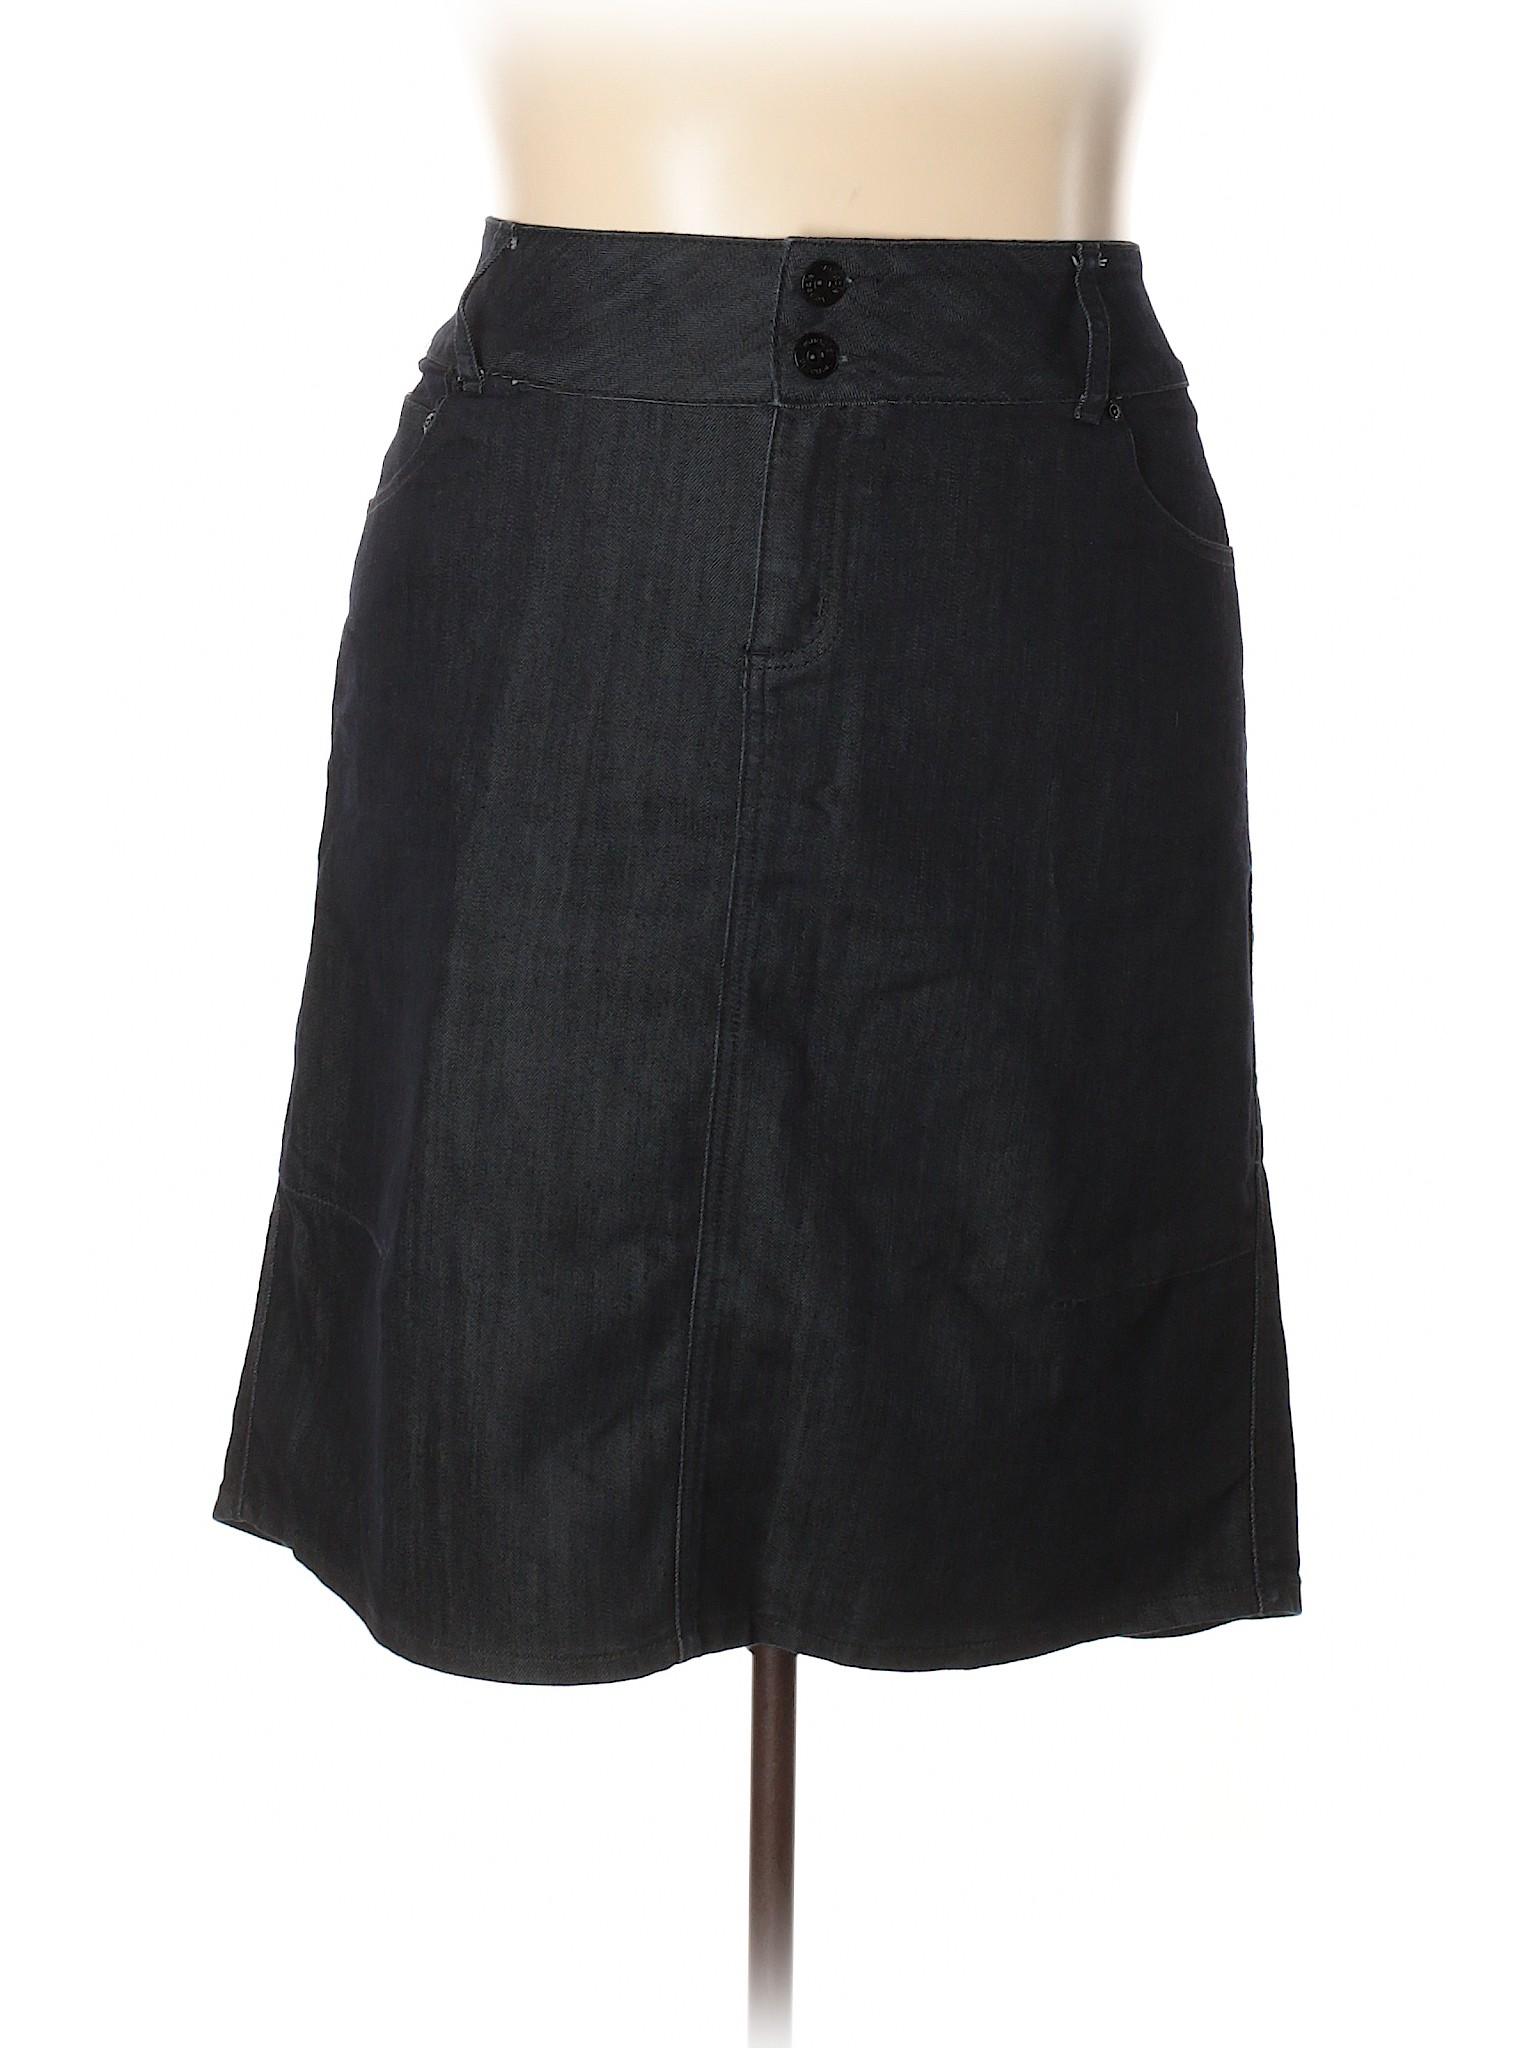 Skirt Skirt Denim Boutique Denim Denim Boutique Skirt Denim Boutique Boutique xAzqwEg1z